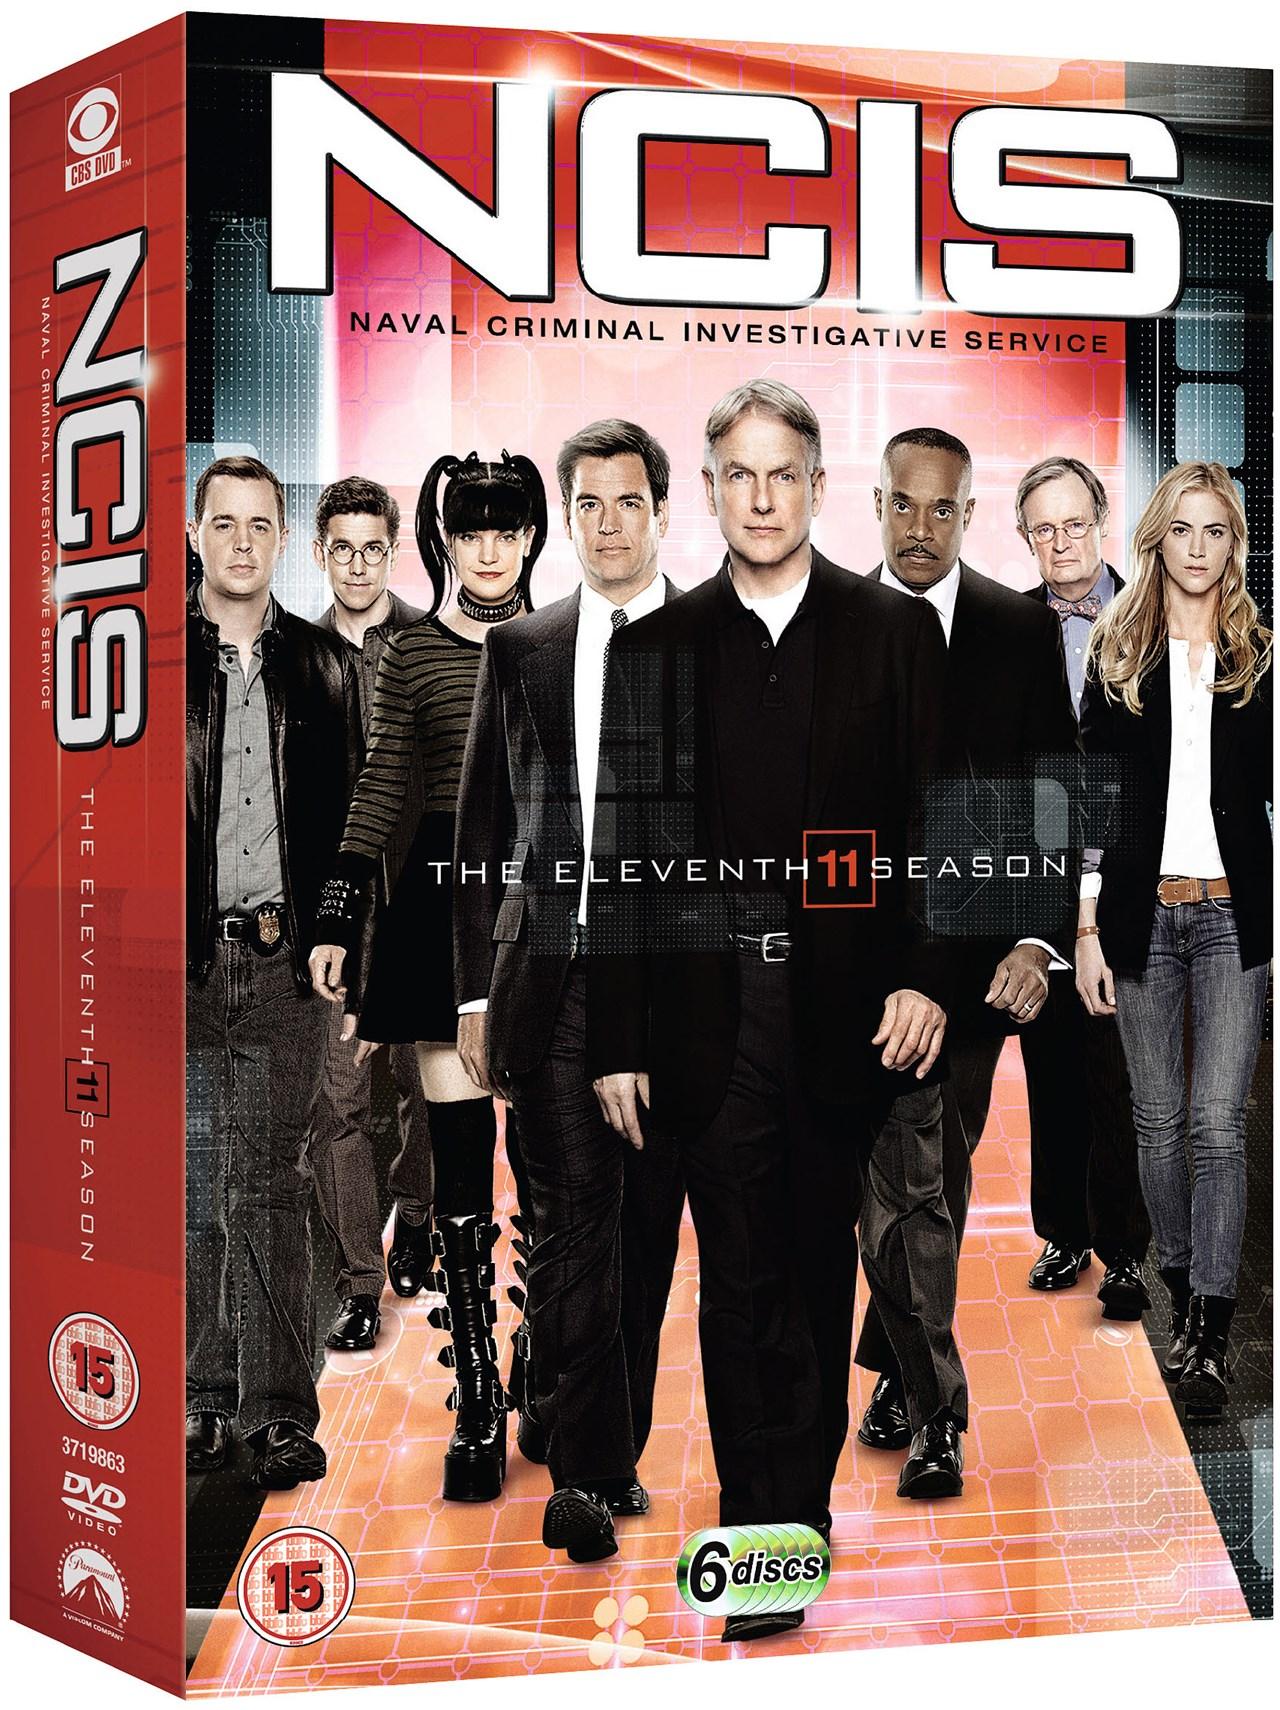 NCIS: The Eleventh Season - 2